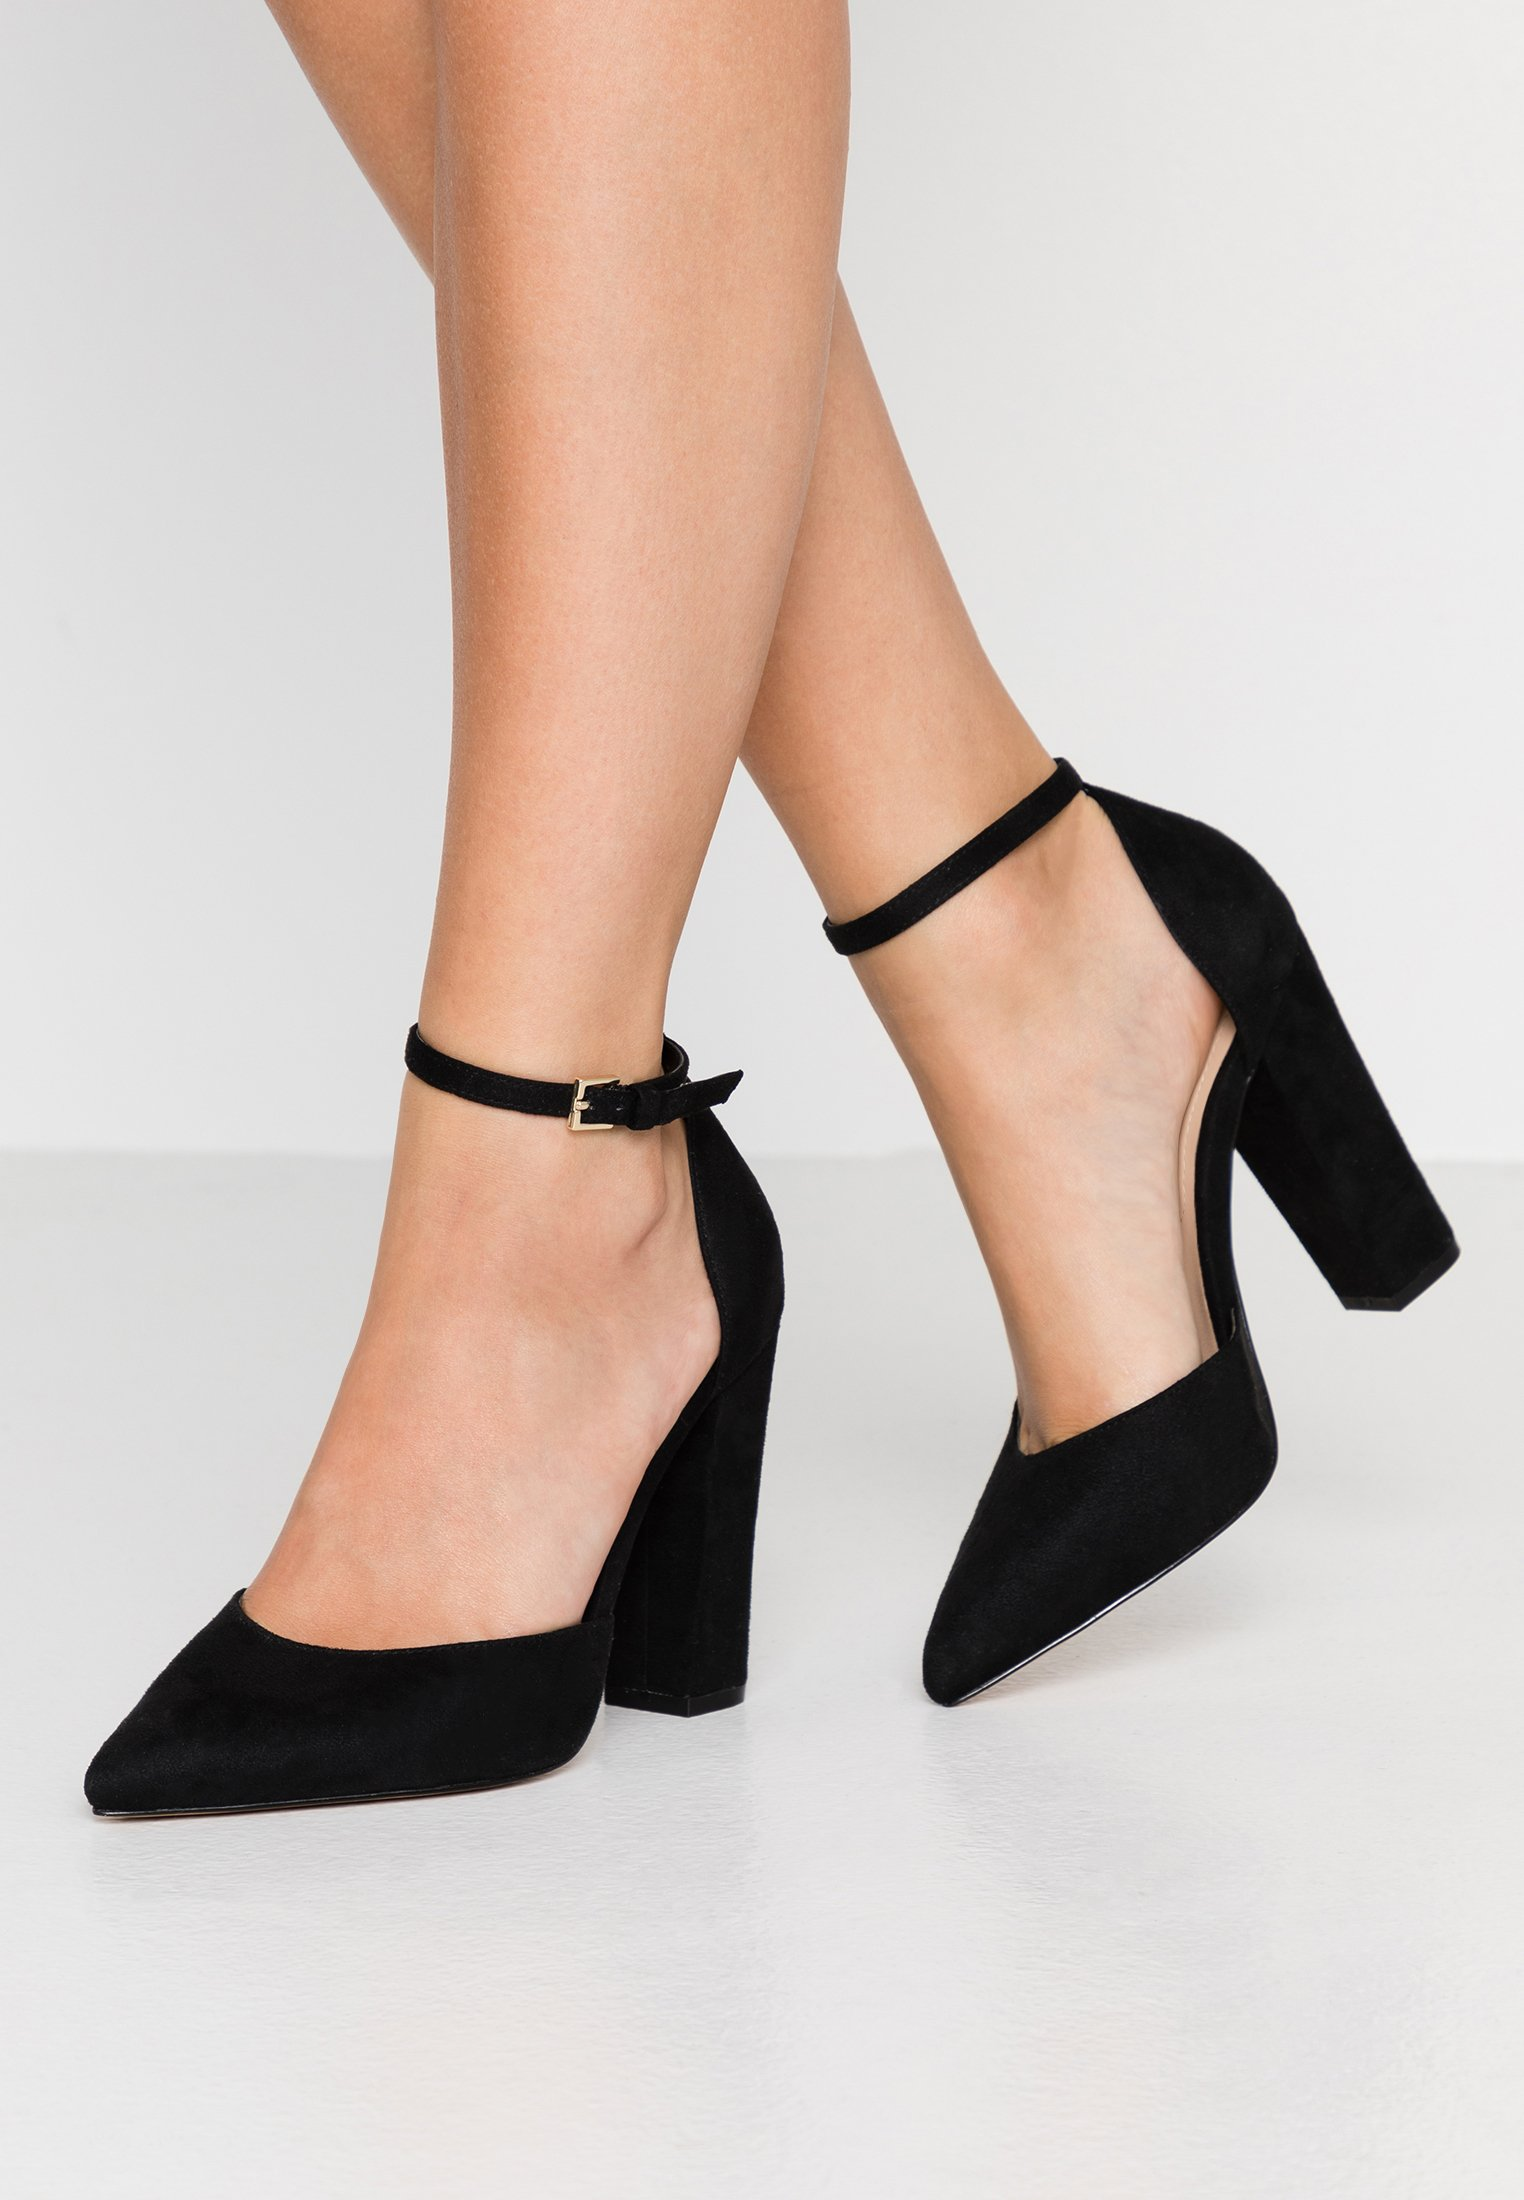 Stylowe i eleganckie szpilki damskie Rubi Shoes by Cotton On